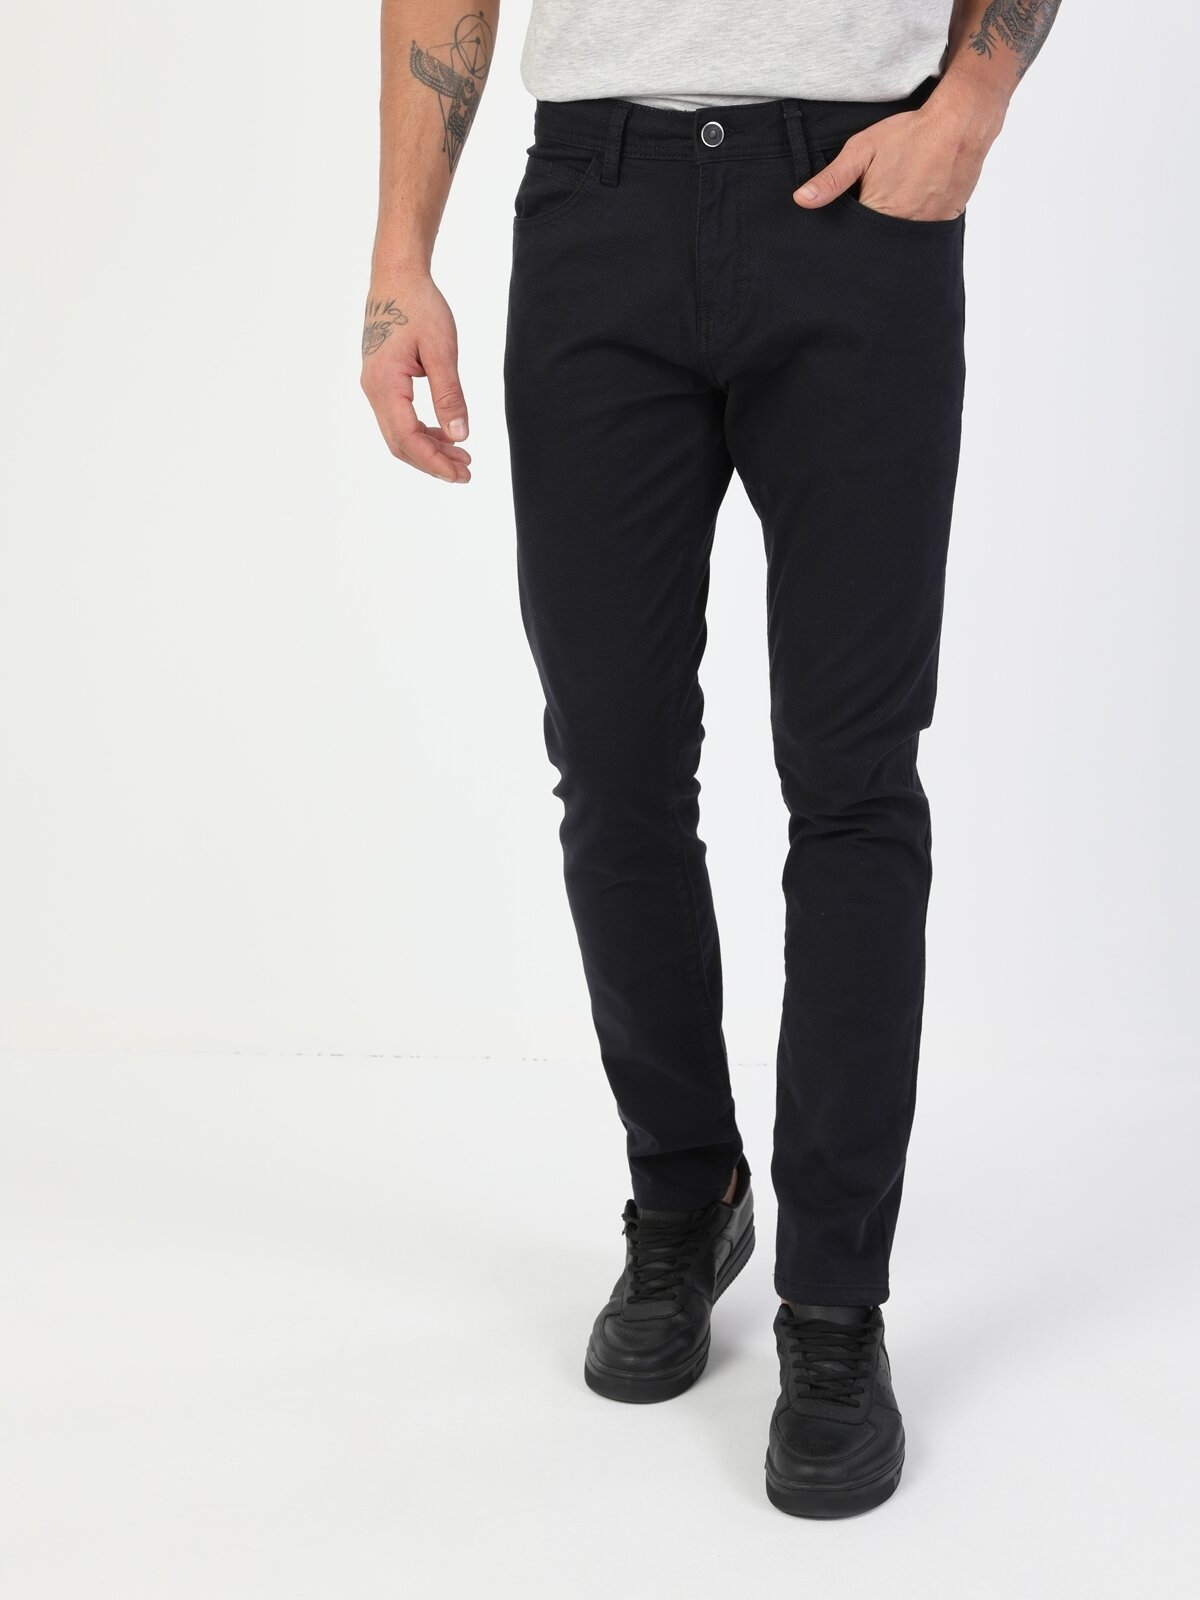 Düz Paça Normal Bel Lacivert Chino Erkek Pantolon